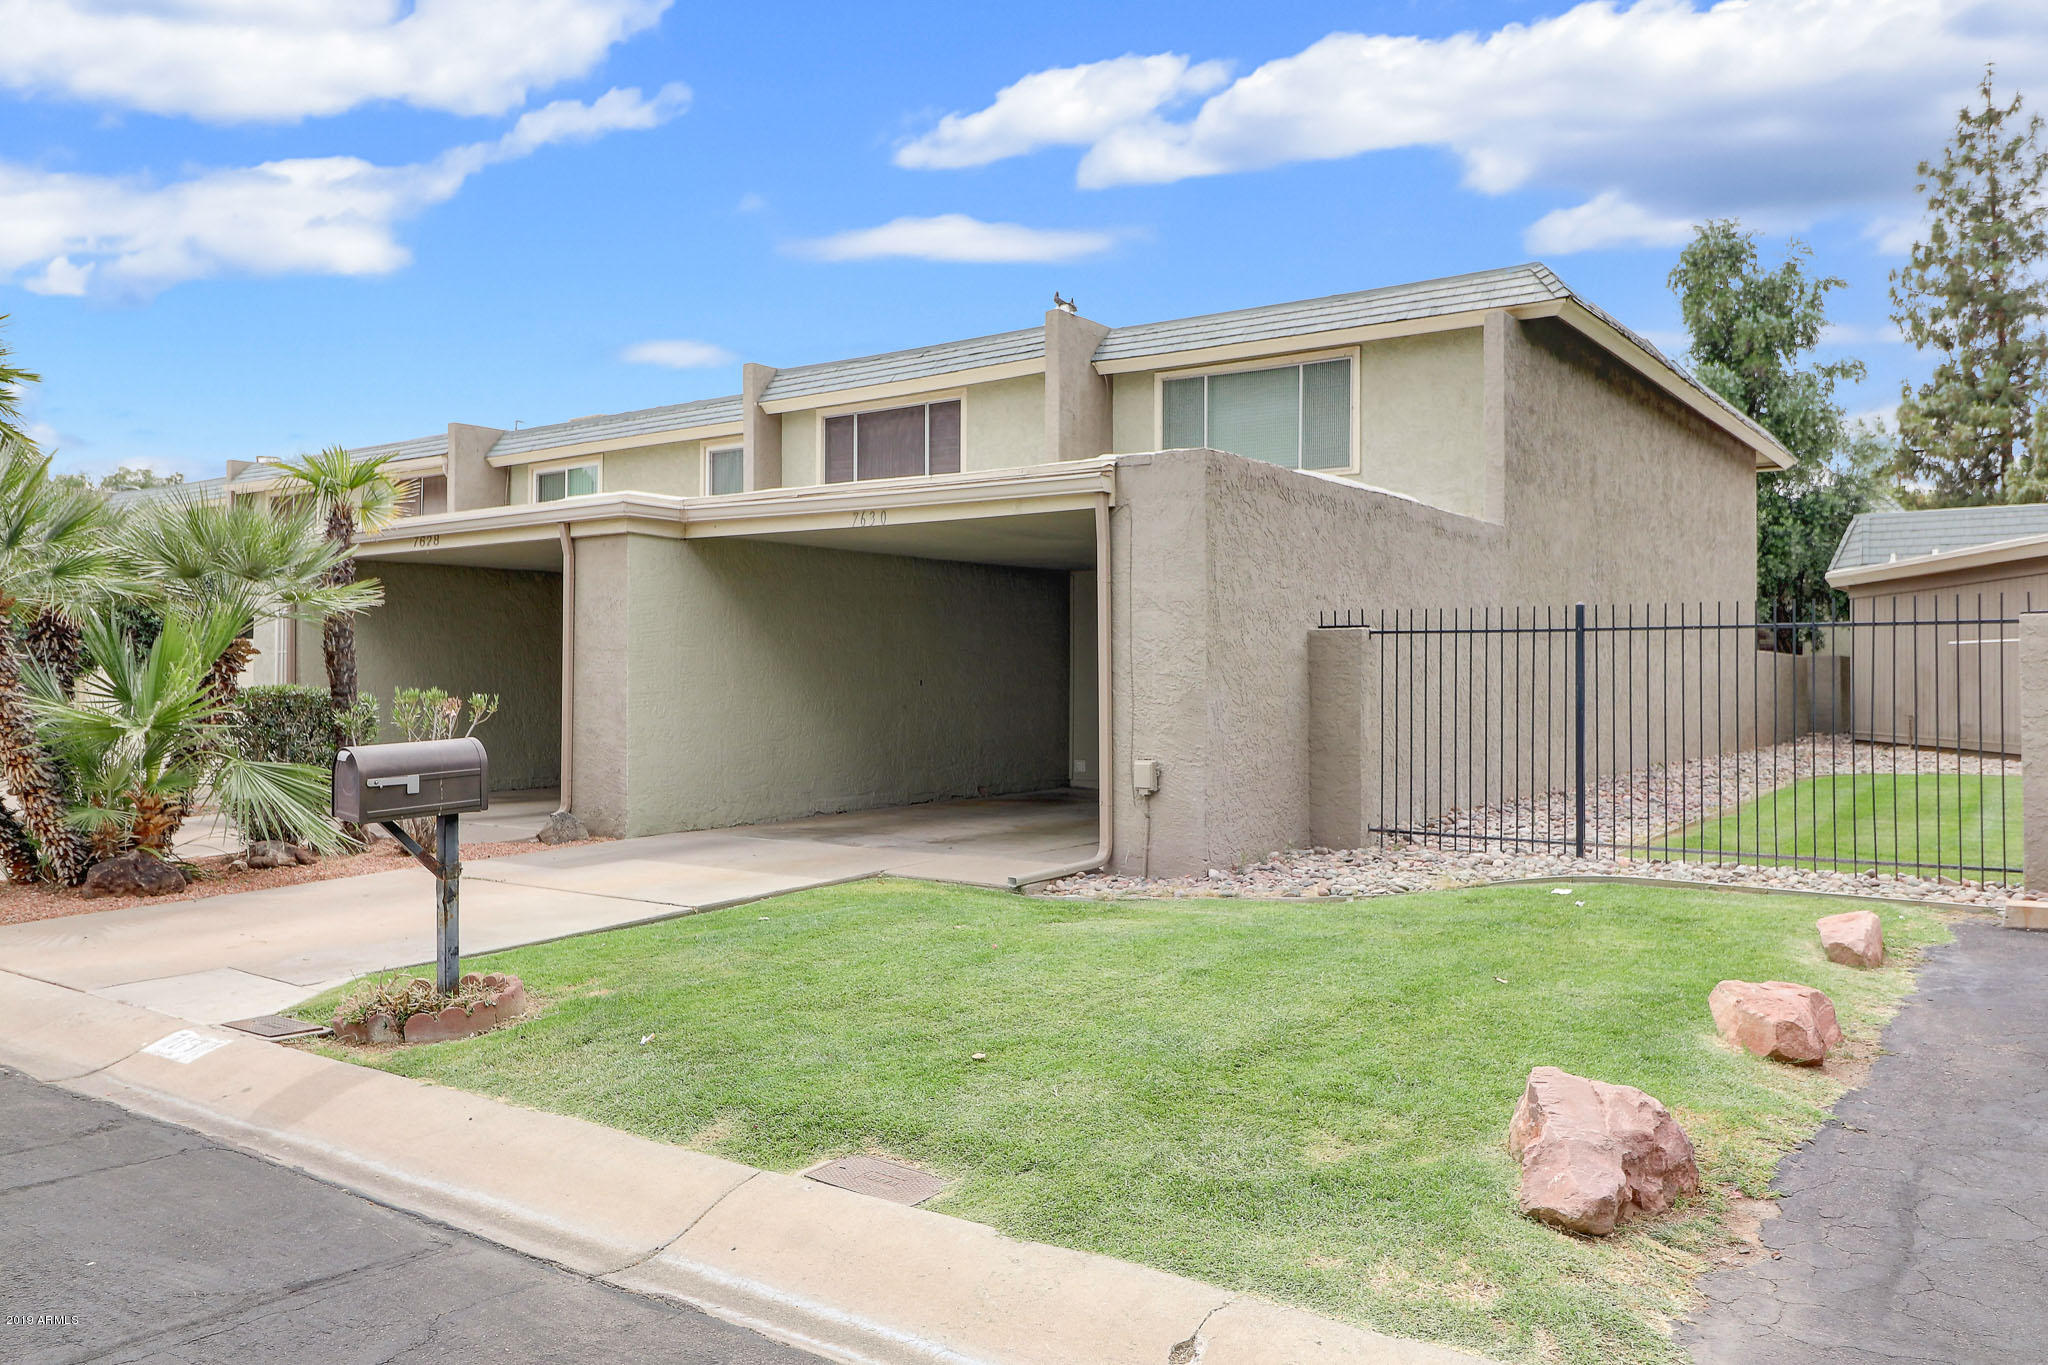 Photo of 7630 N 19TH Drive, Phoenix, AZ 85021